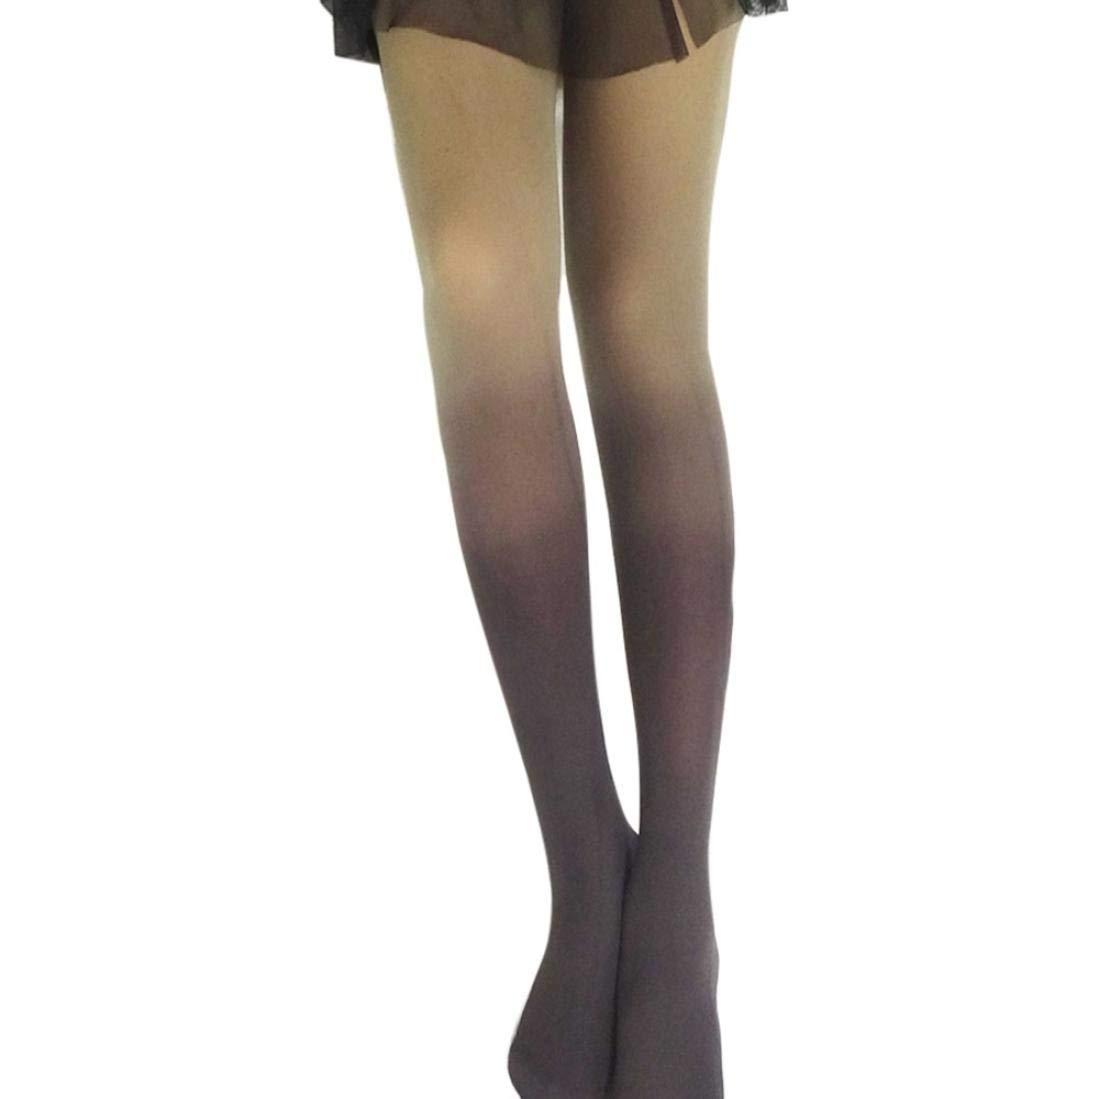 Black nude girls big booty